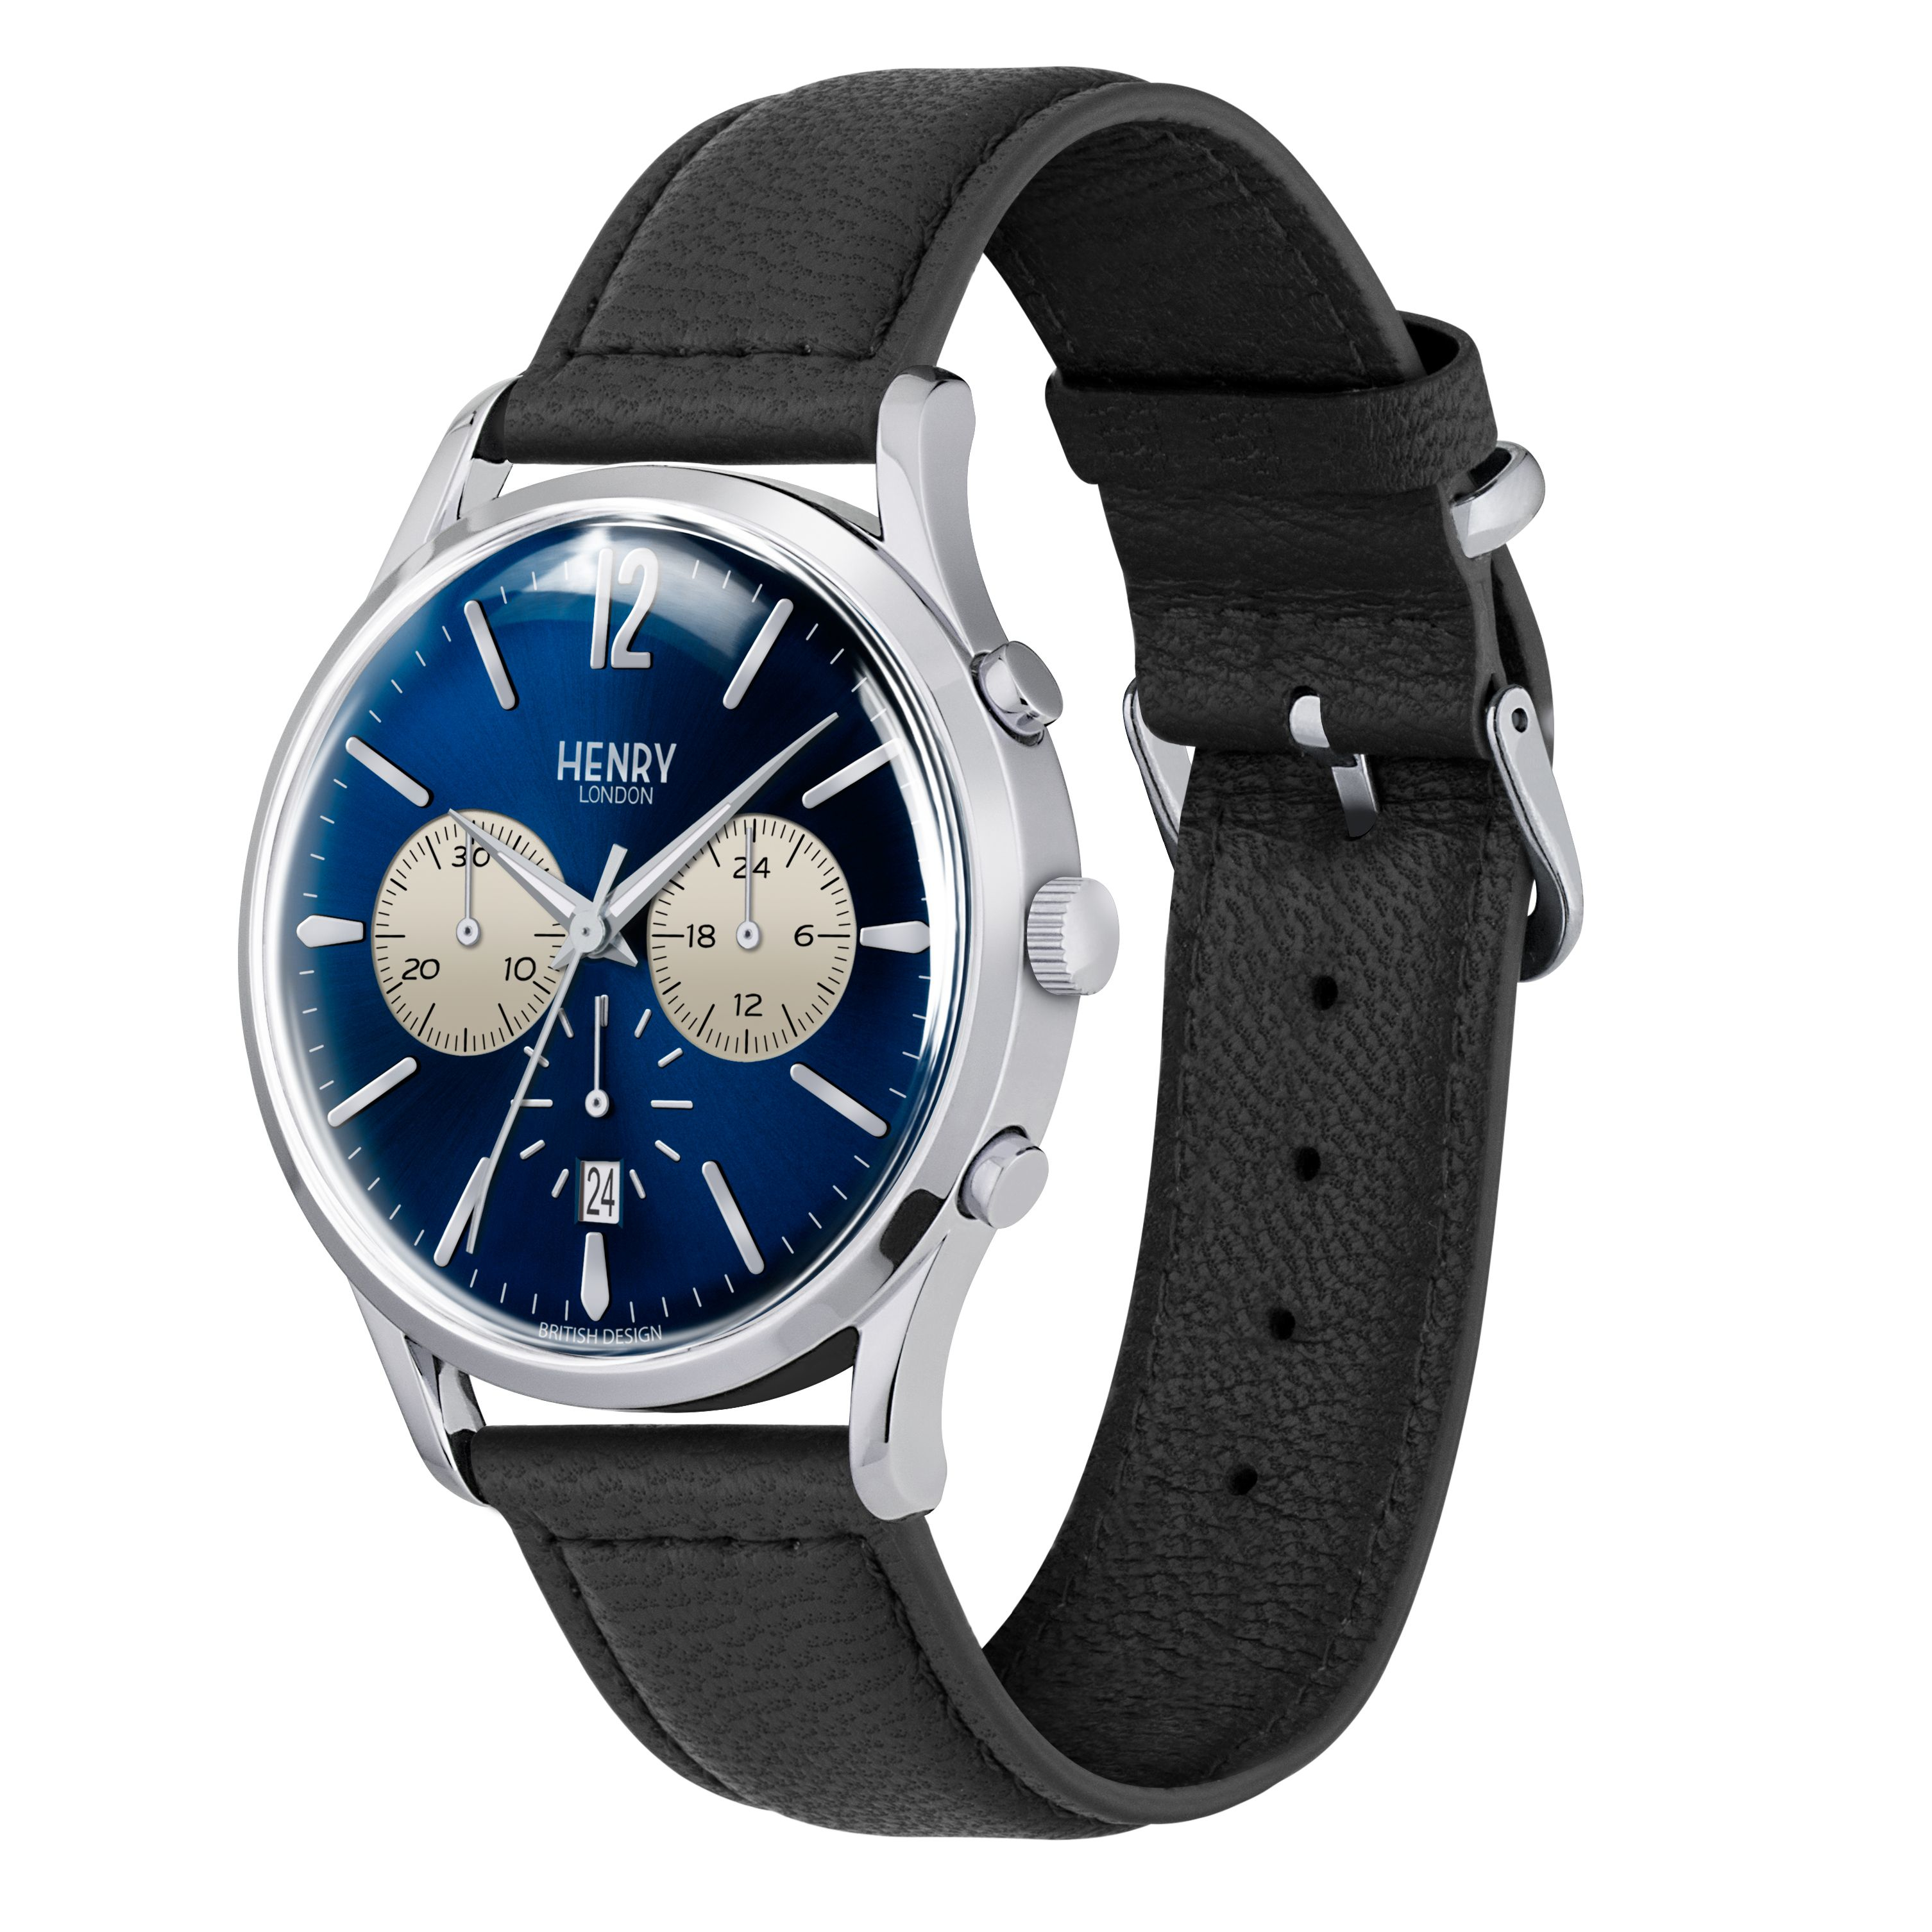 lyst henry london knightsbridge leather strap watch in blue for men. Black Bedroom Furniture Sets. Home Design Ideas